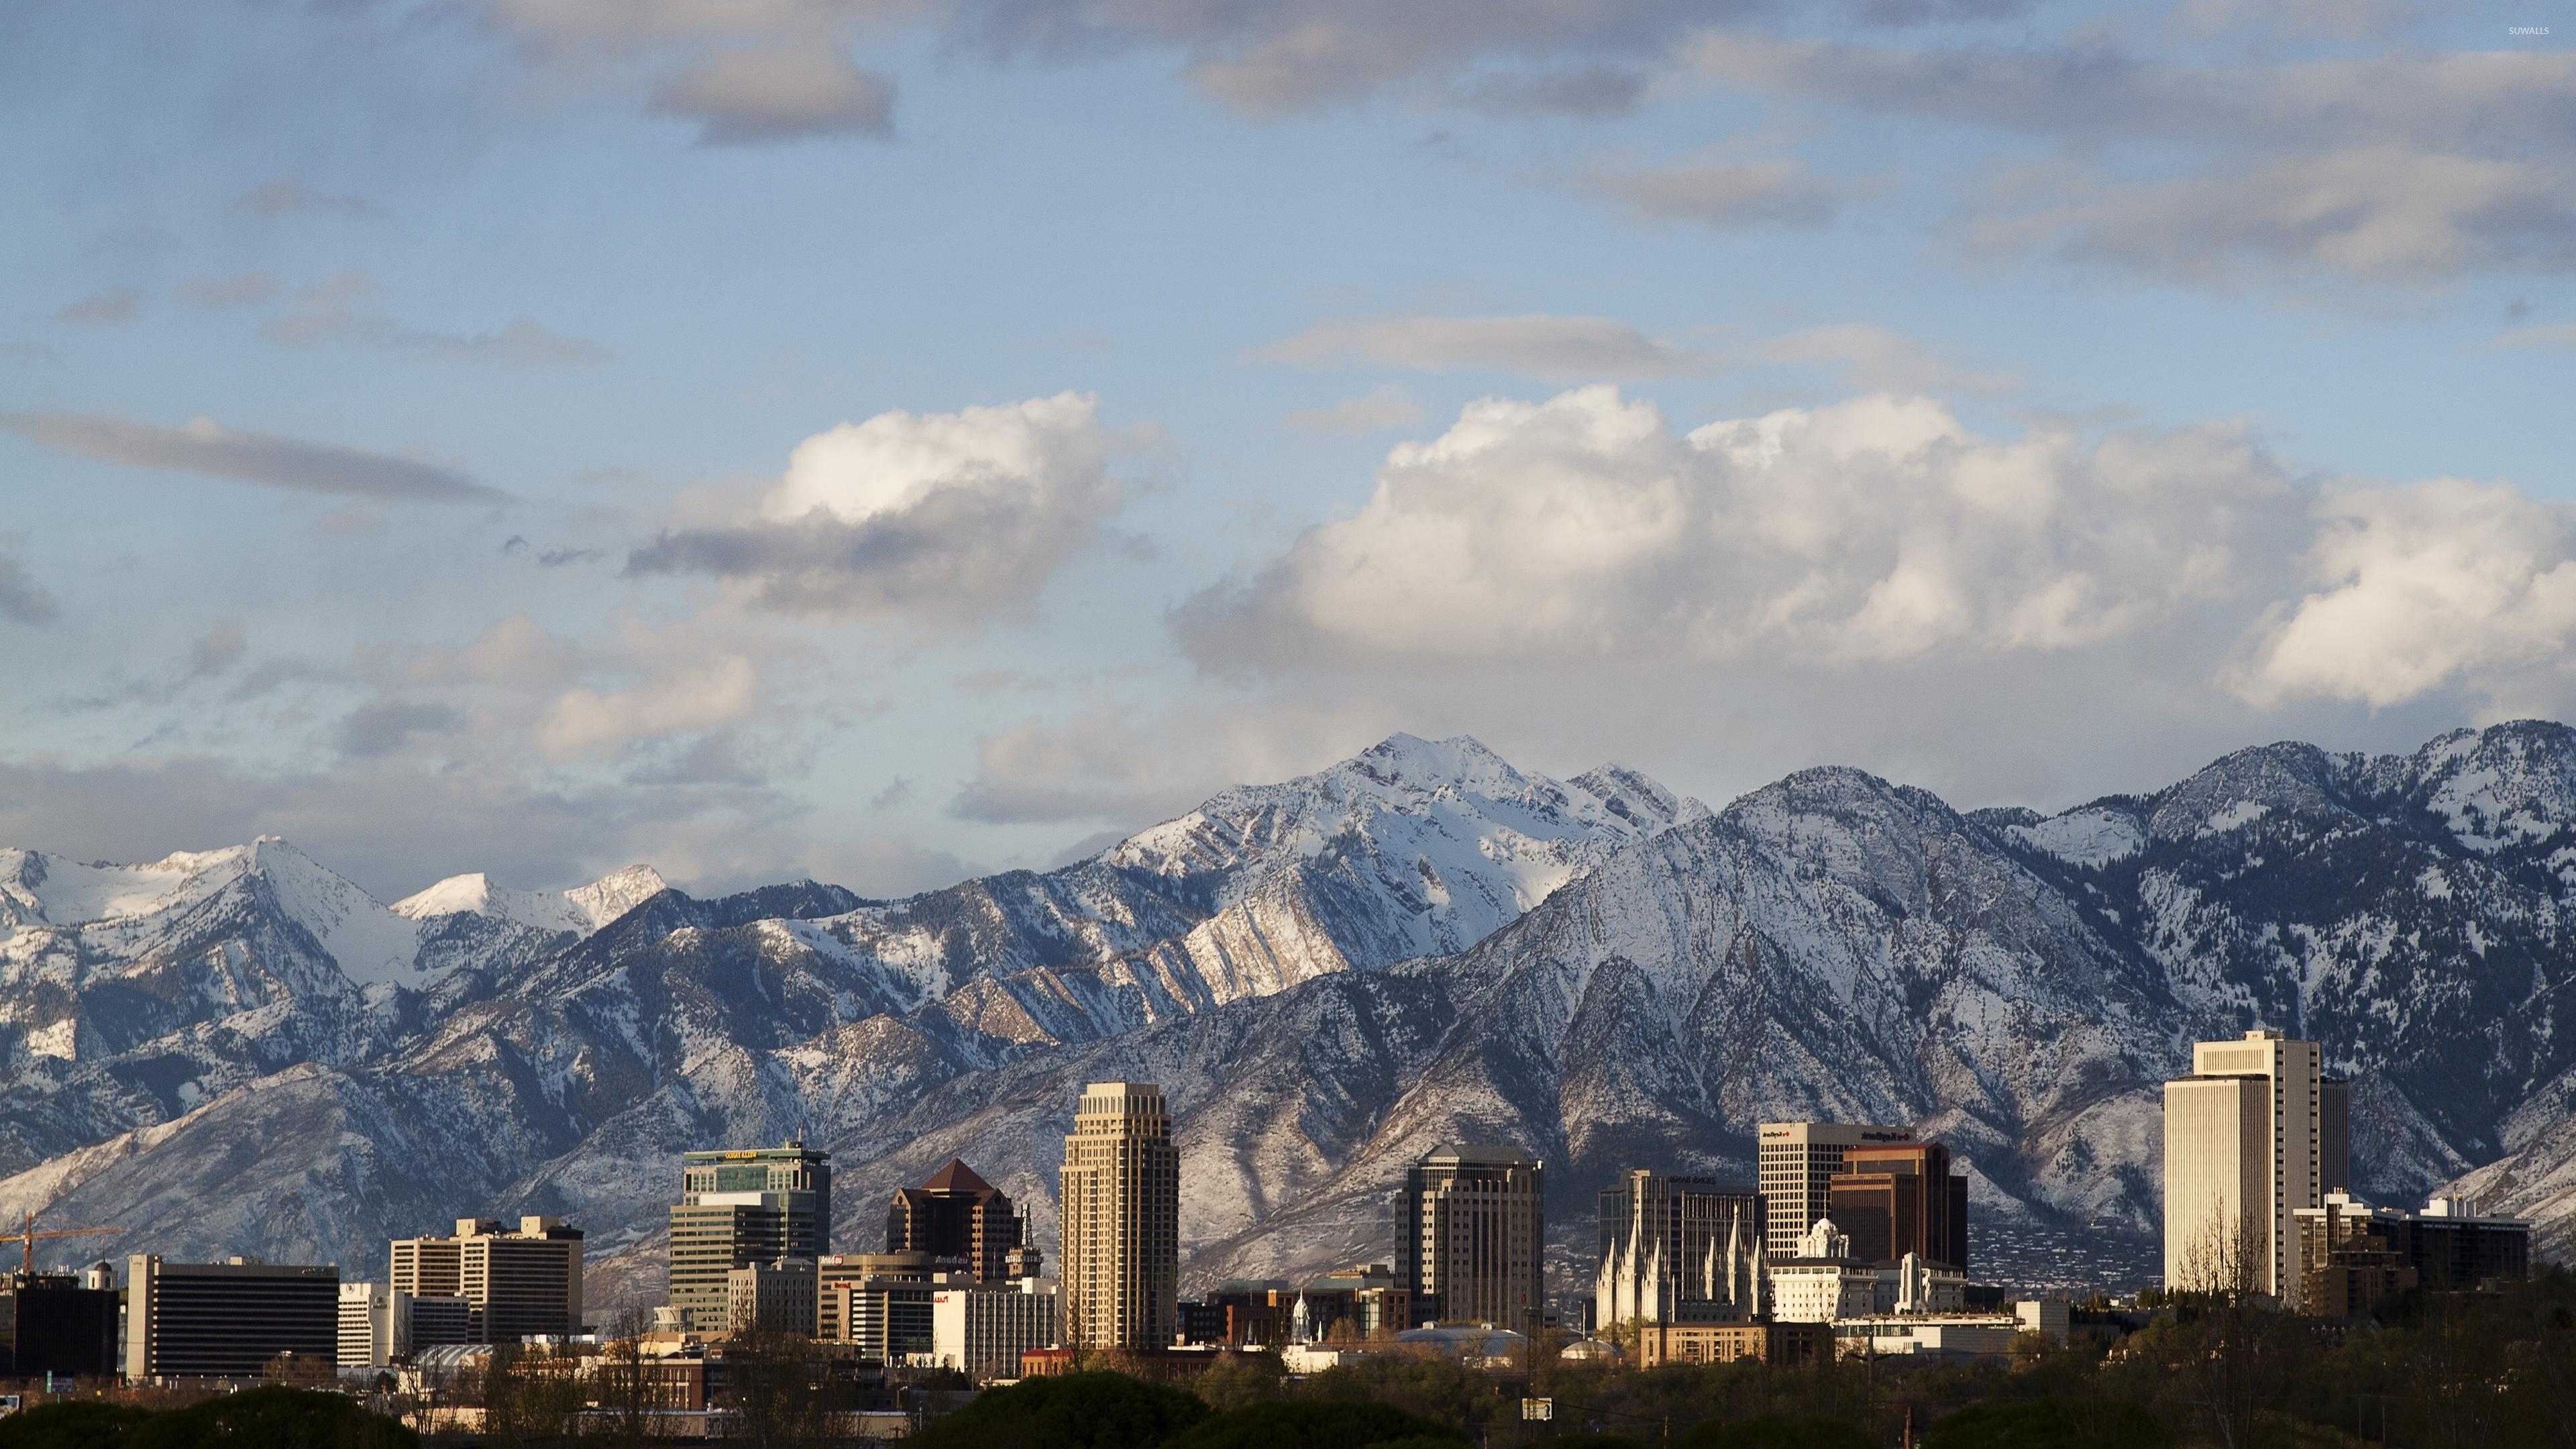 Salt Lake City wallpaper World wallpapers 43900 1280x800